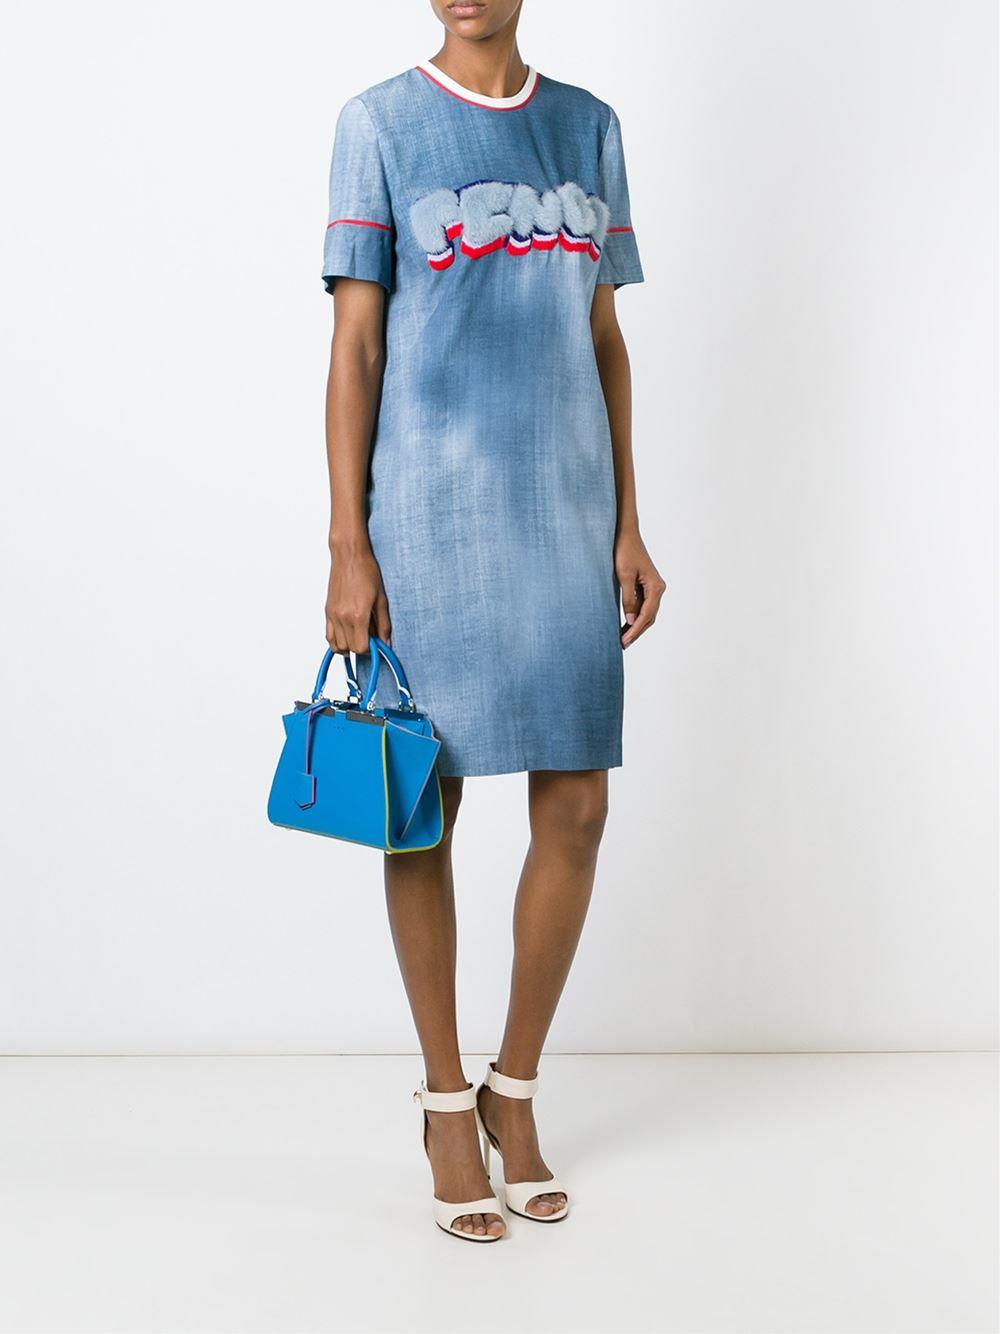 8afacdd632 Lyst - Fendi Mini  3jours  Crossbody Bag in Blue